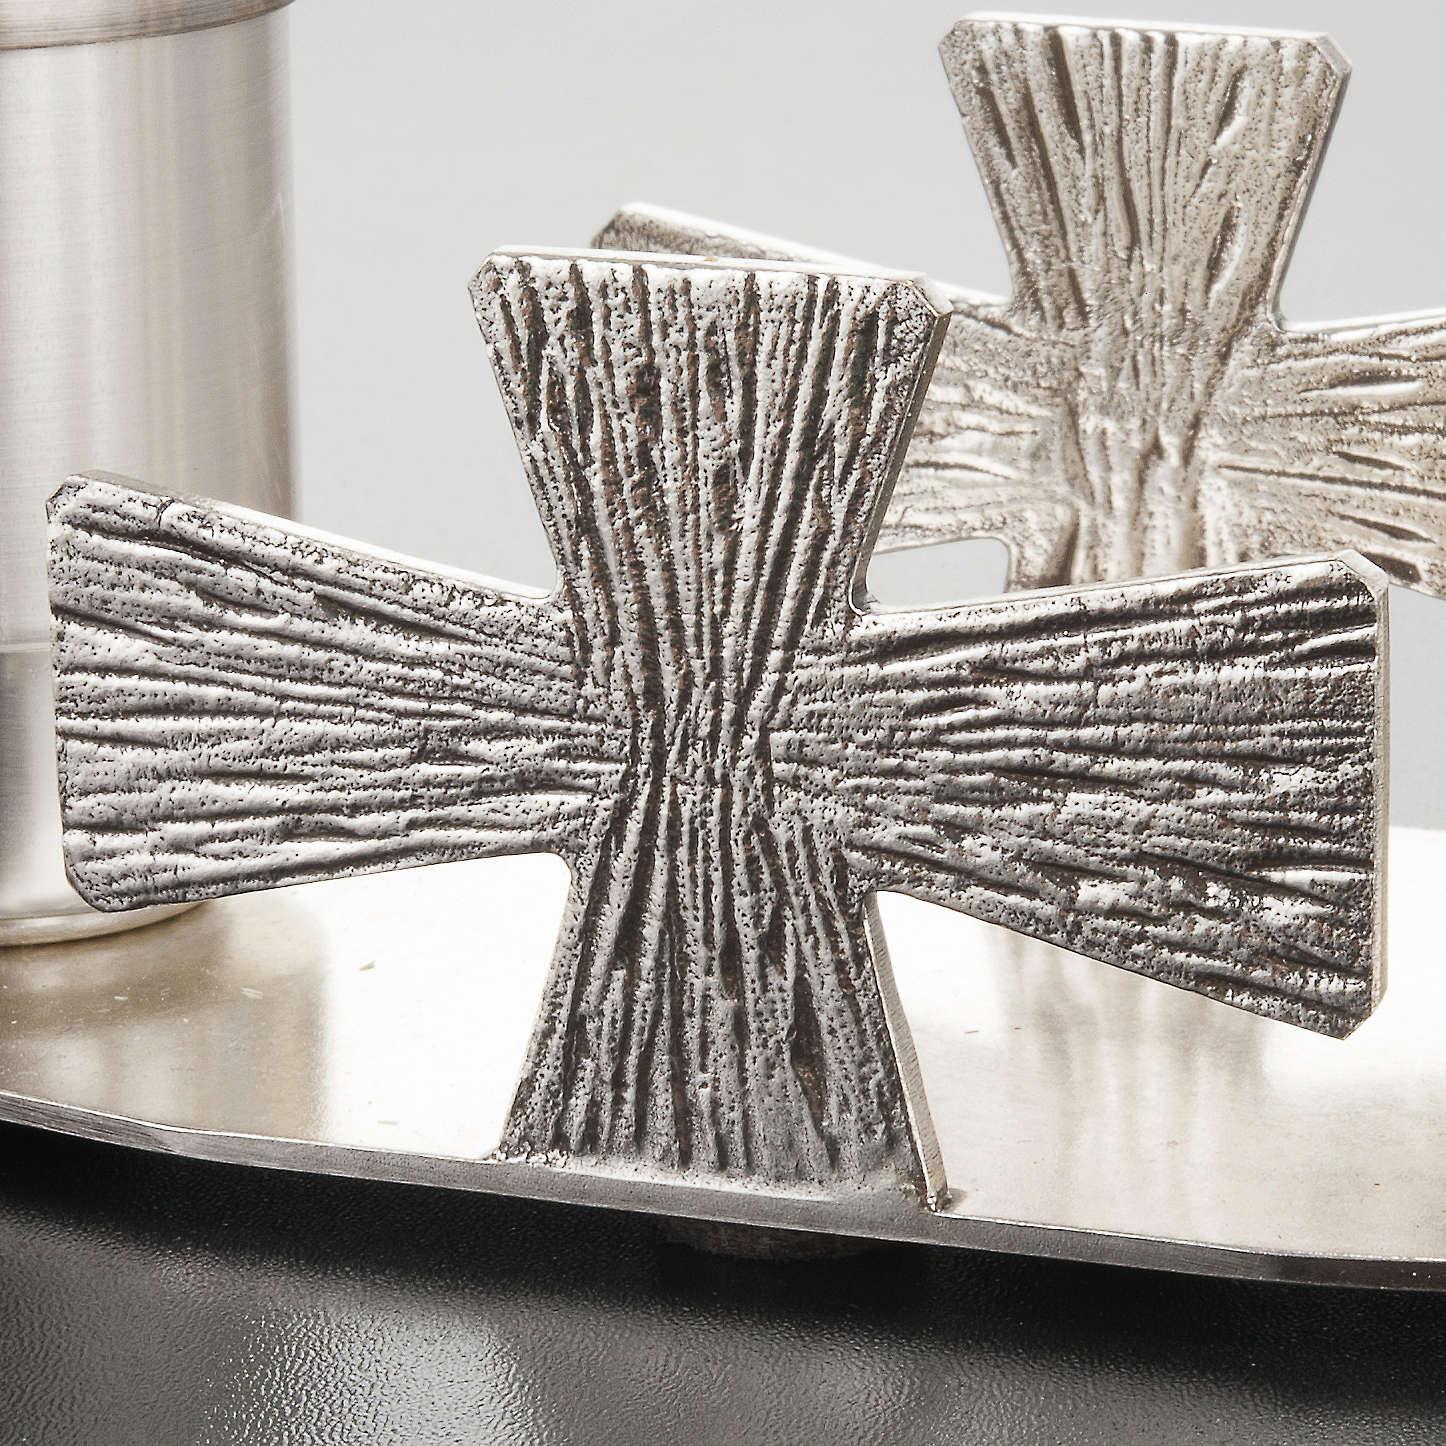 Servicio para bautismo latón plateado cruces 3